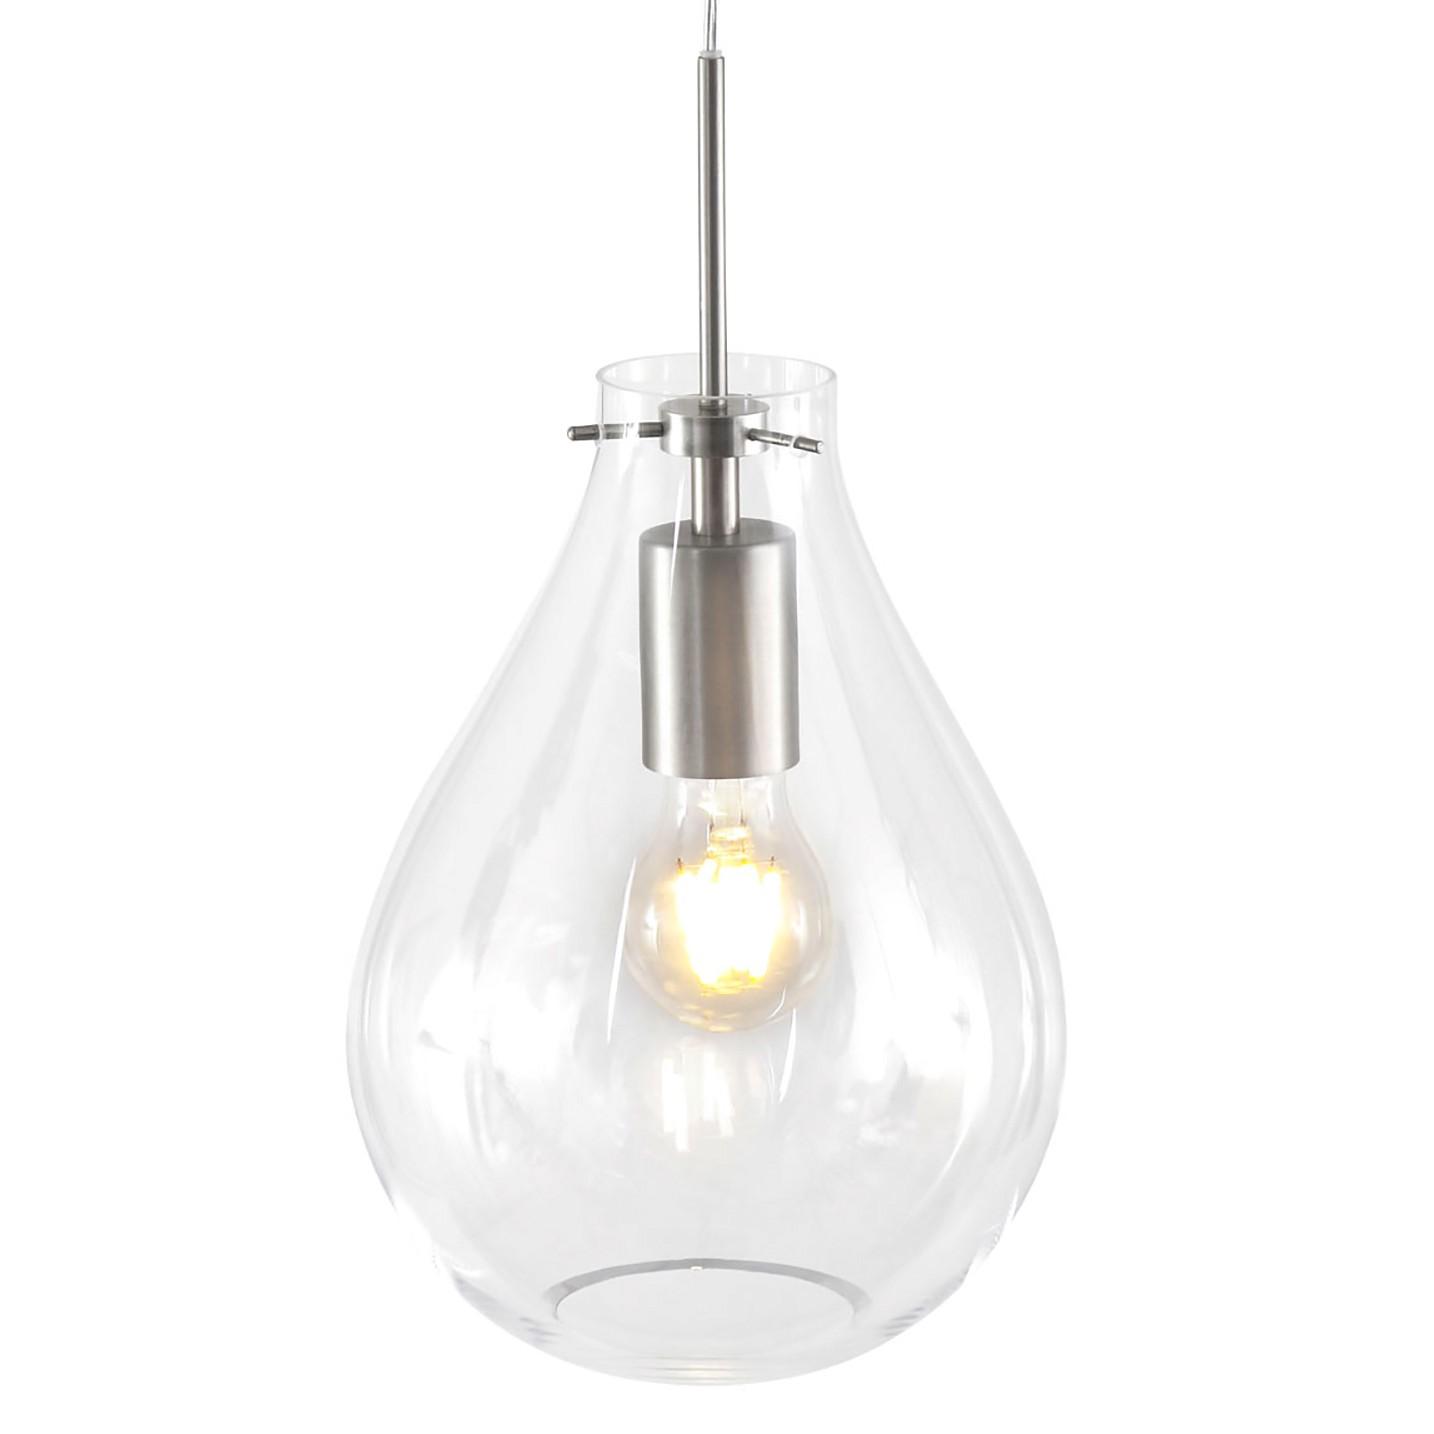 home24 Pendelleuchte Glass Light II